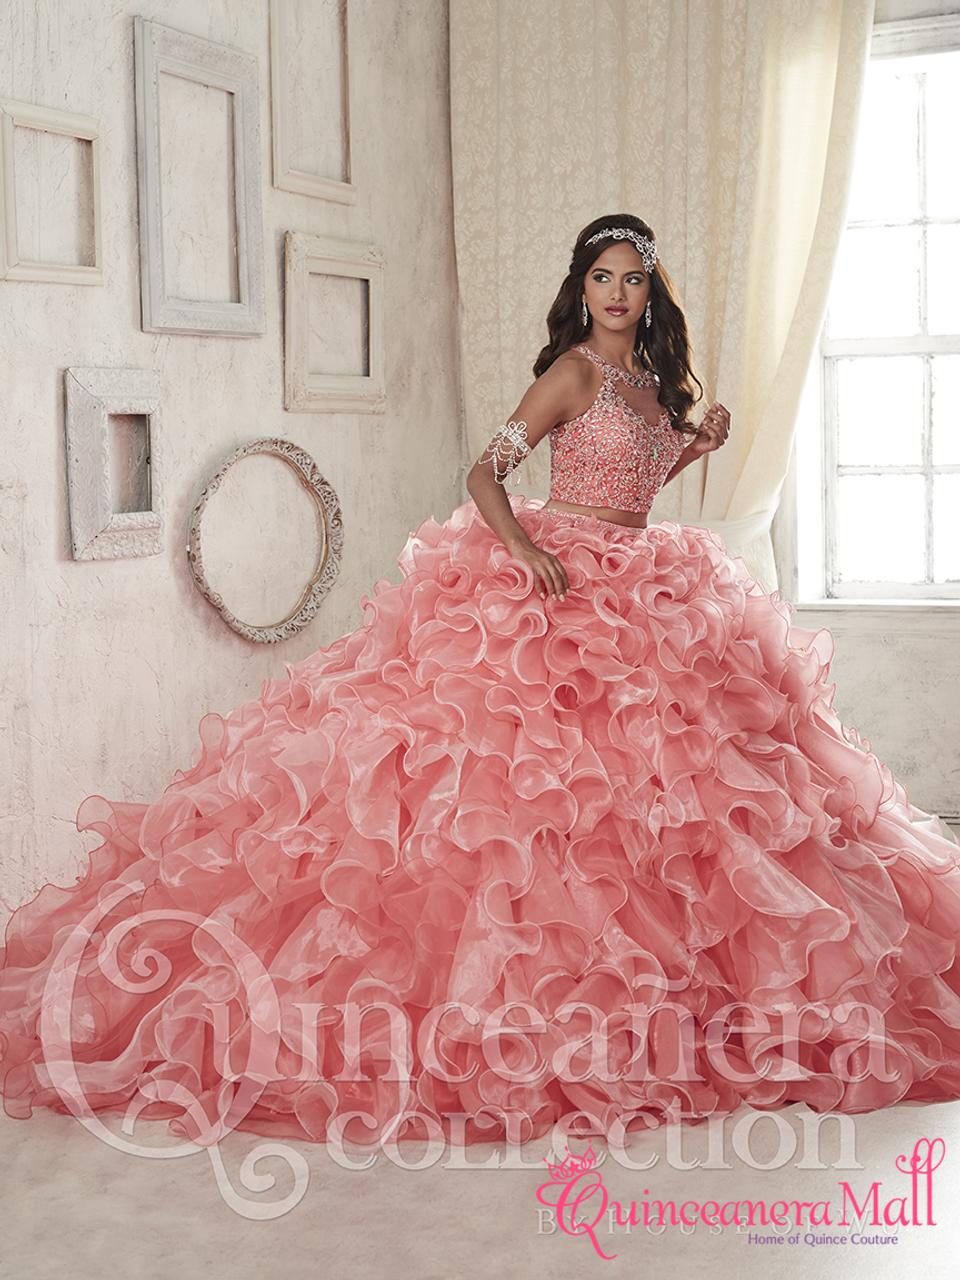 1b3d7e388e6 Quinceanera Dress  26830 - Quinceanera Mall